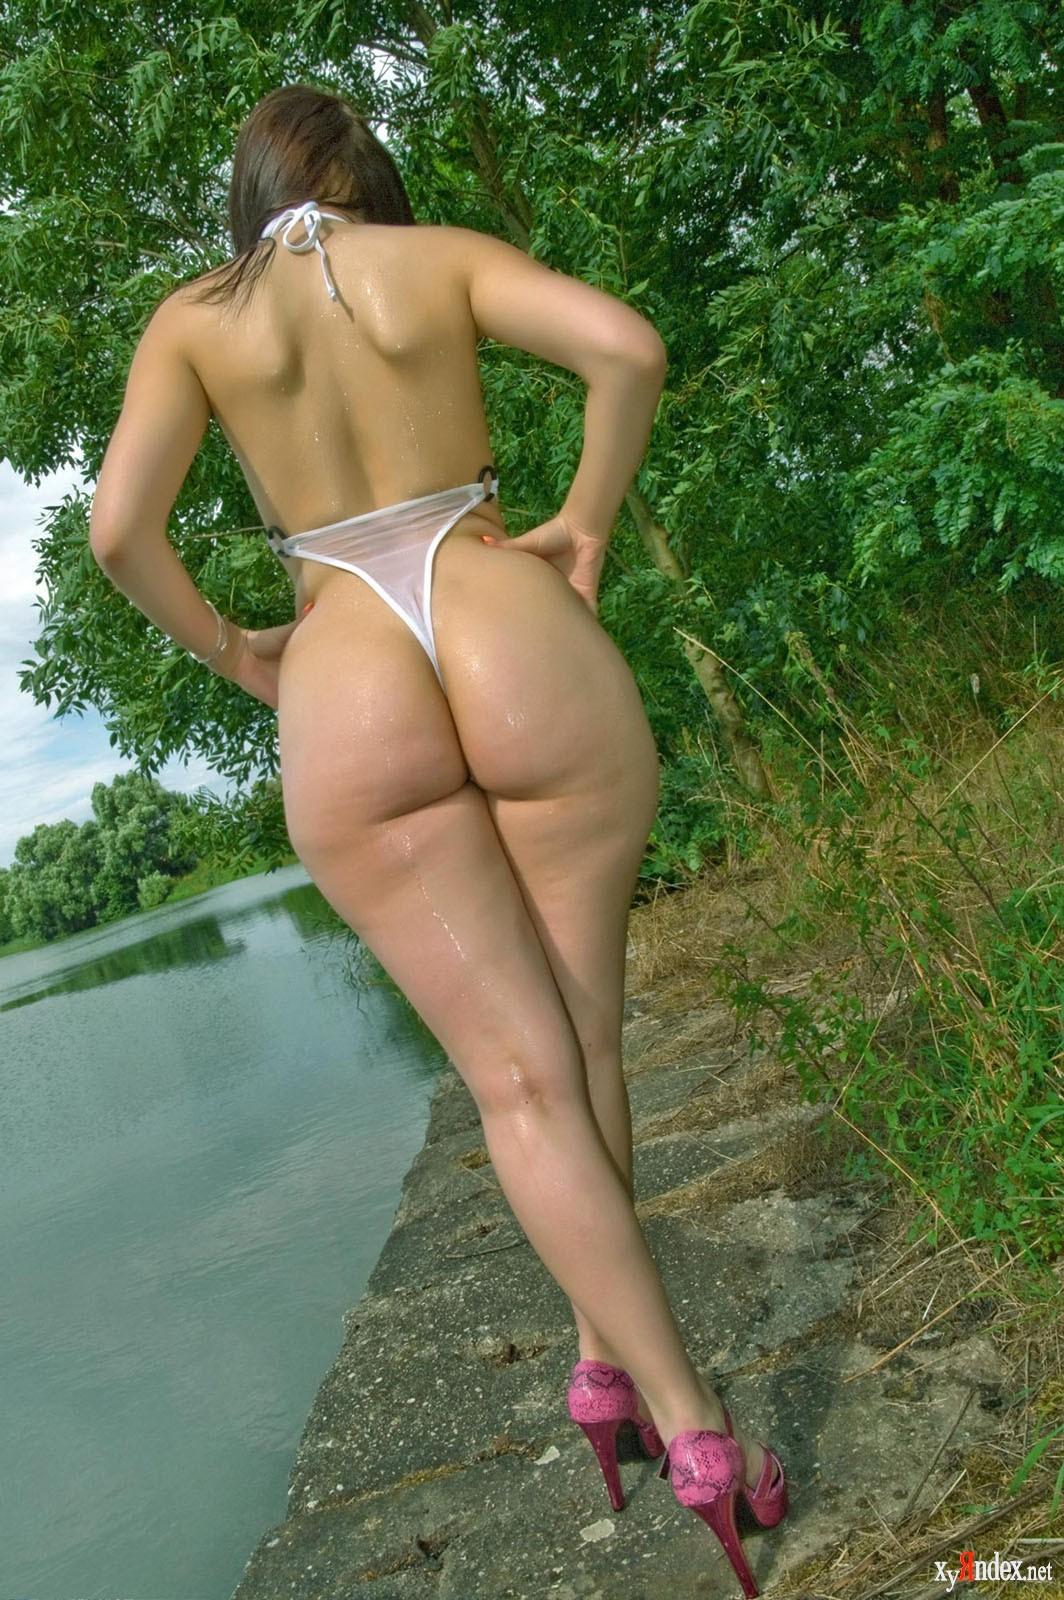 Фото голих женщин с широкими бедрами